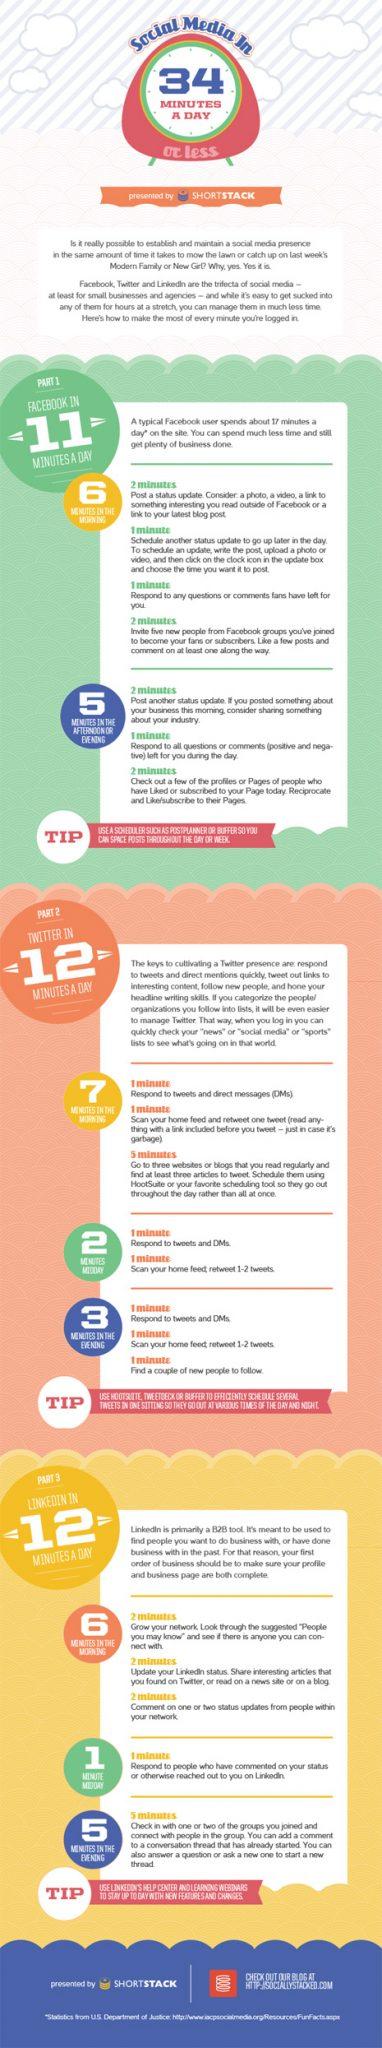 infografia-redes-sociales